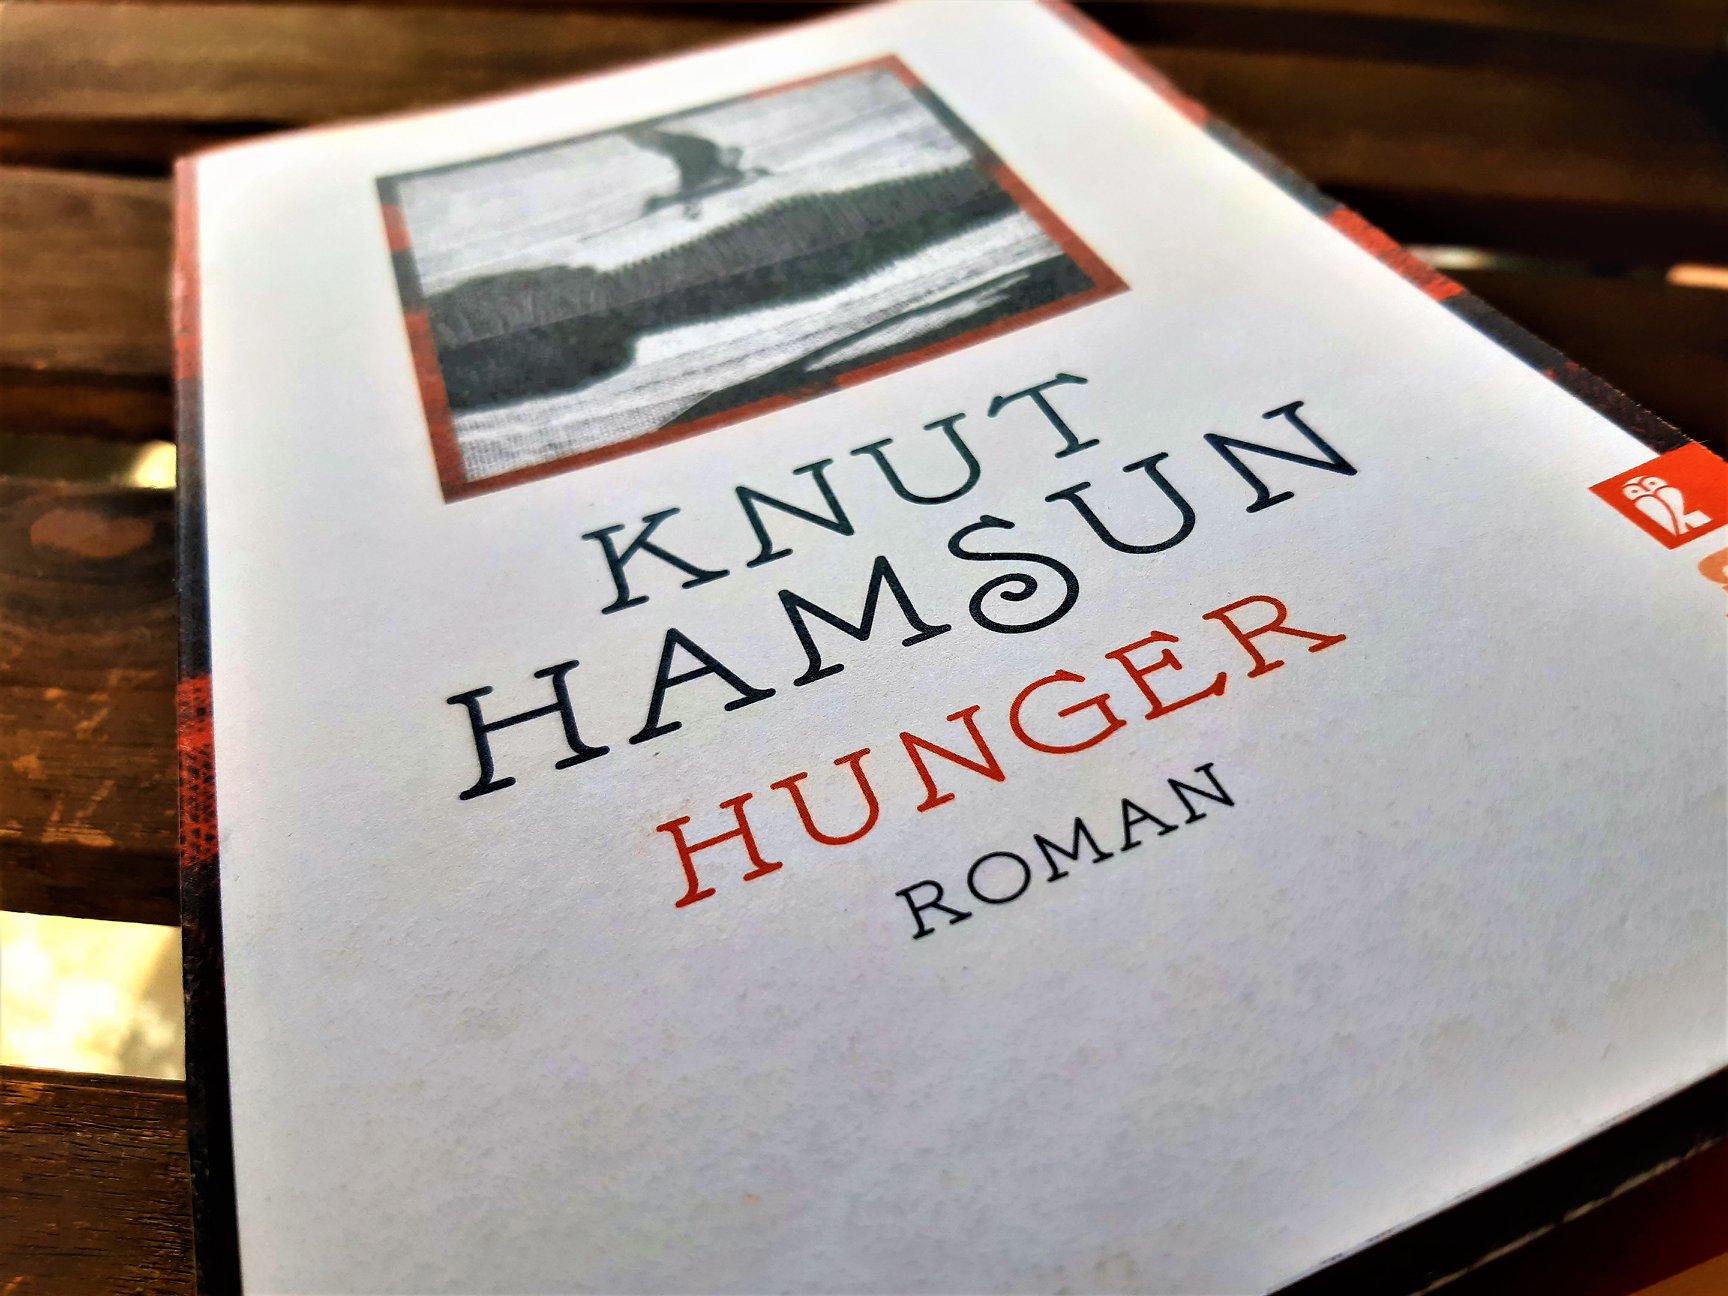 Hamsun, Knut: Hunger